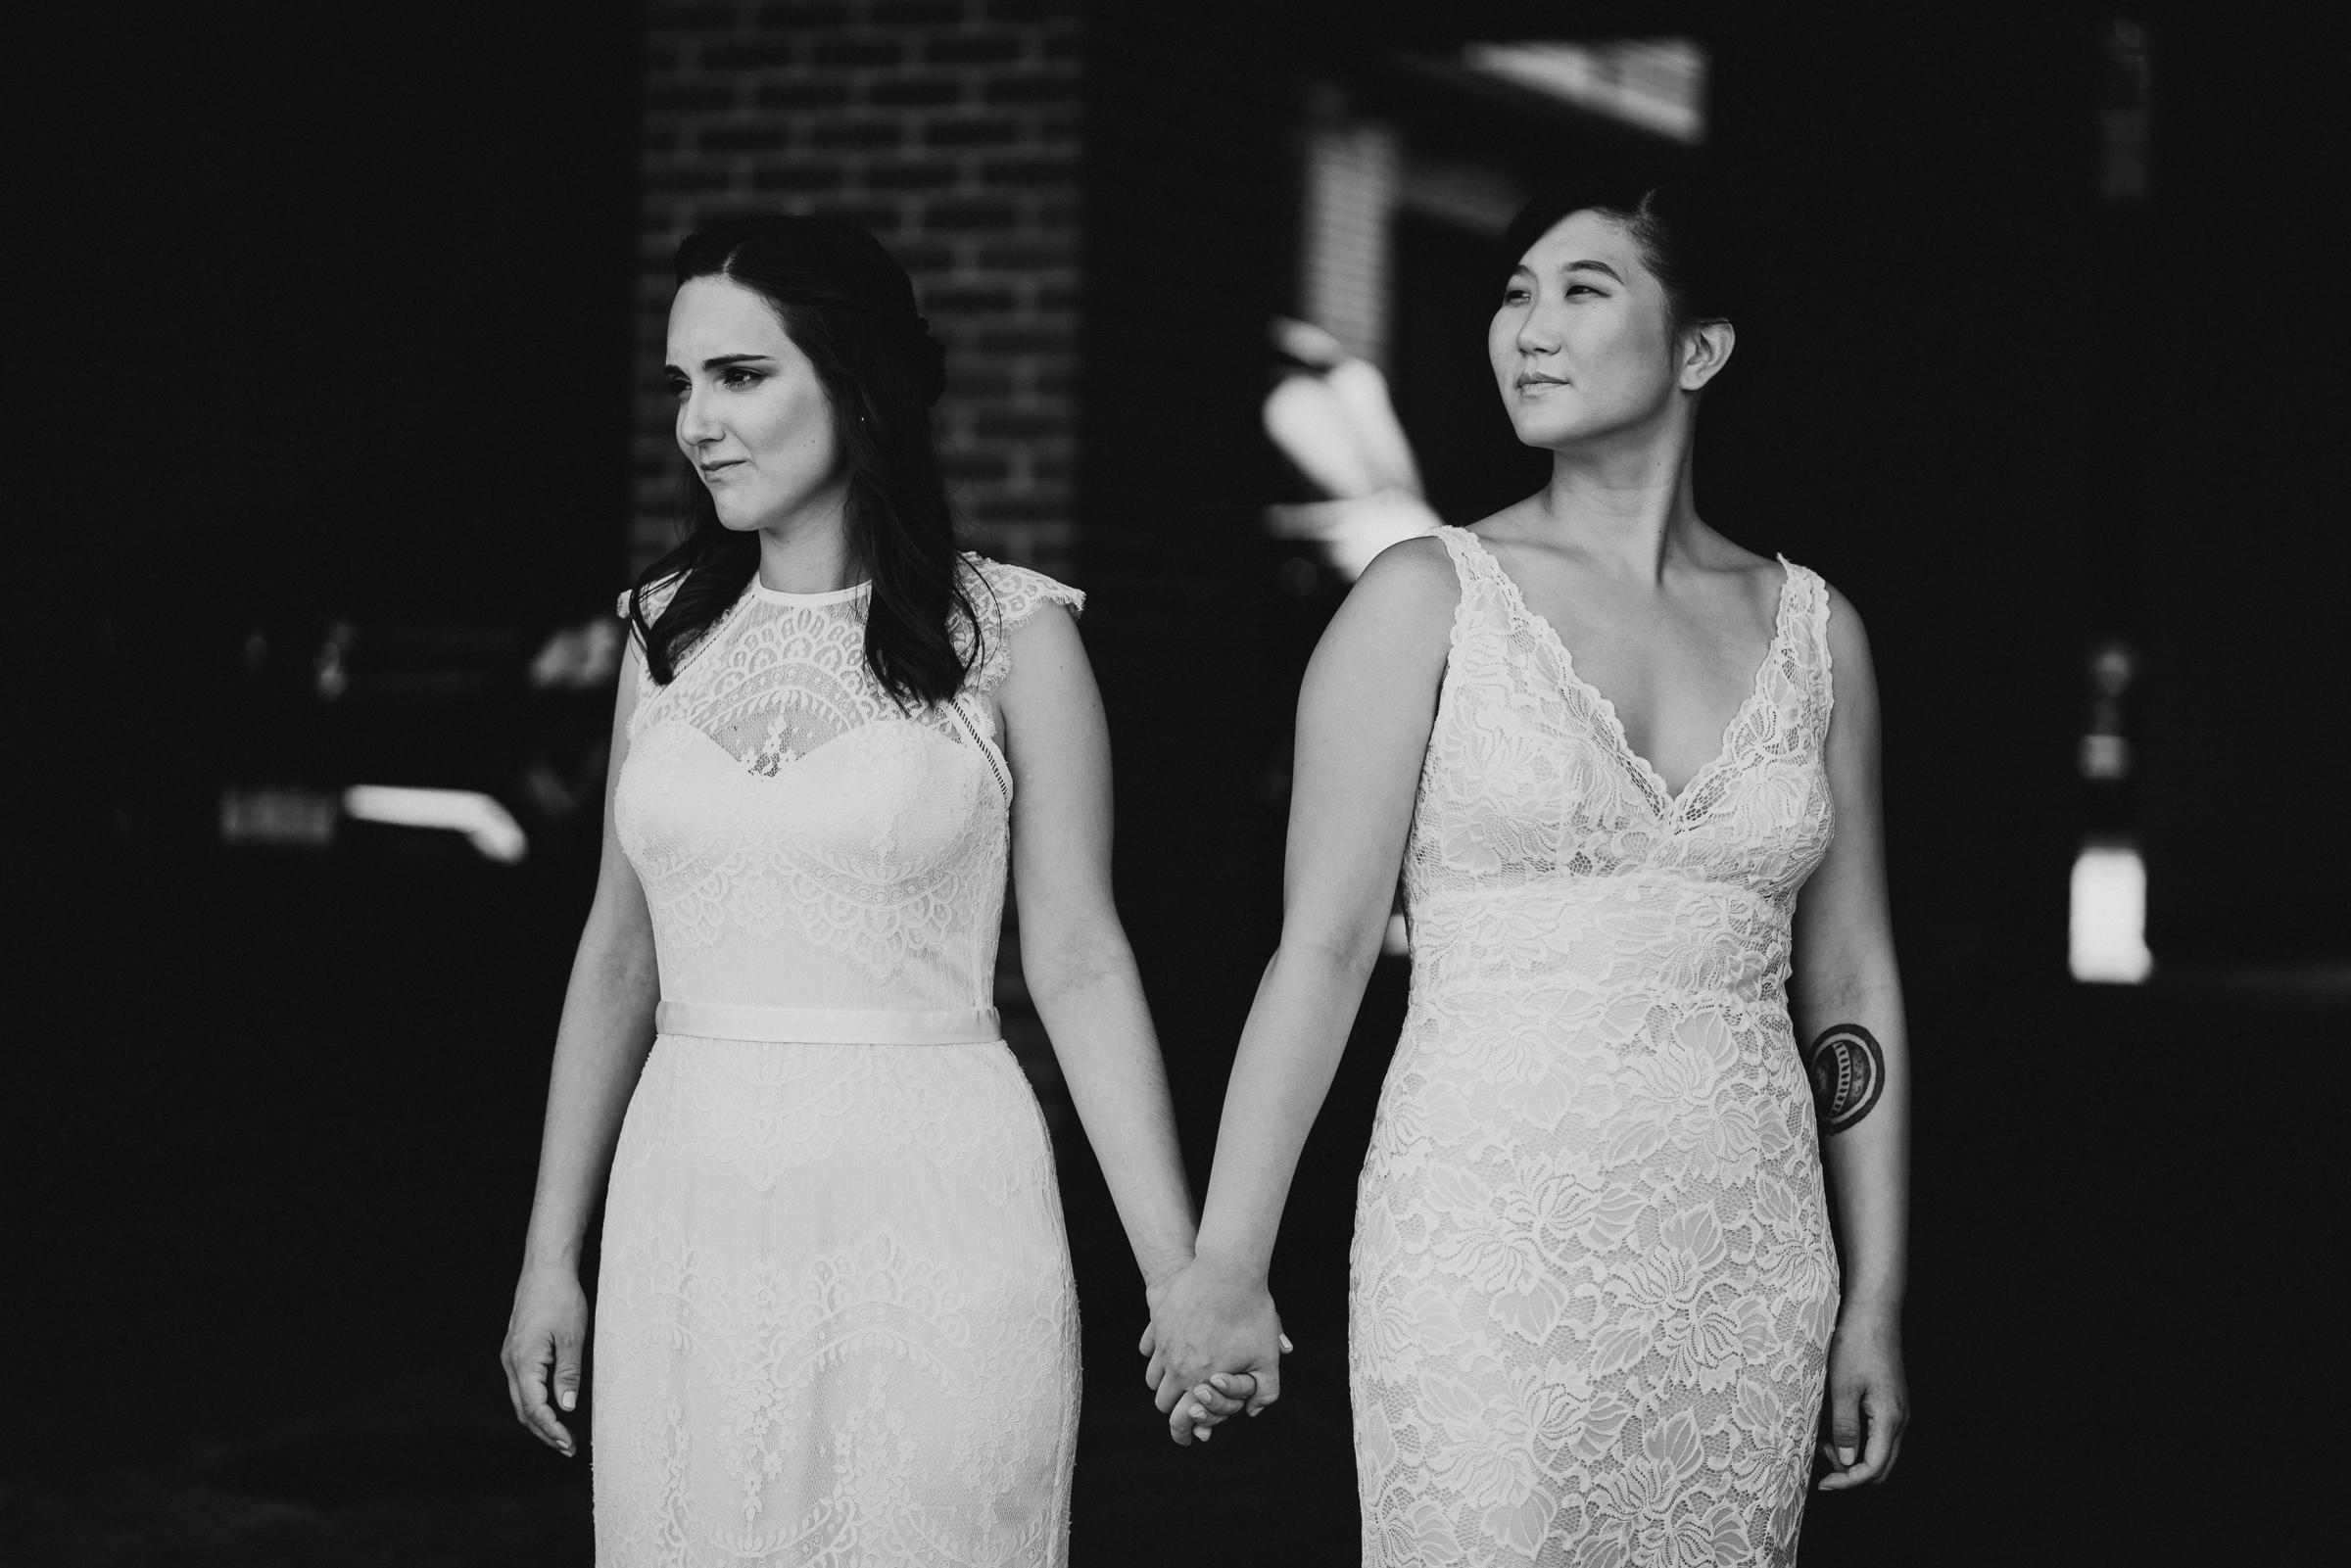 My-Moon-Brooklyn-LGBT-Gay-Documentary-Wedding-Photographer-30.jpg